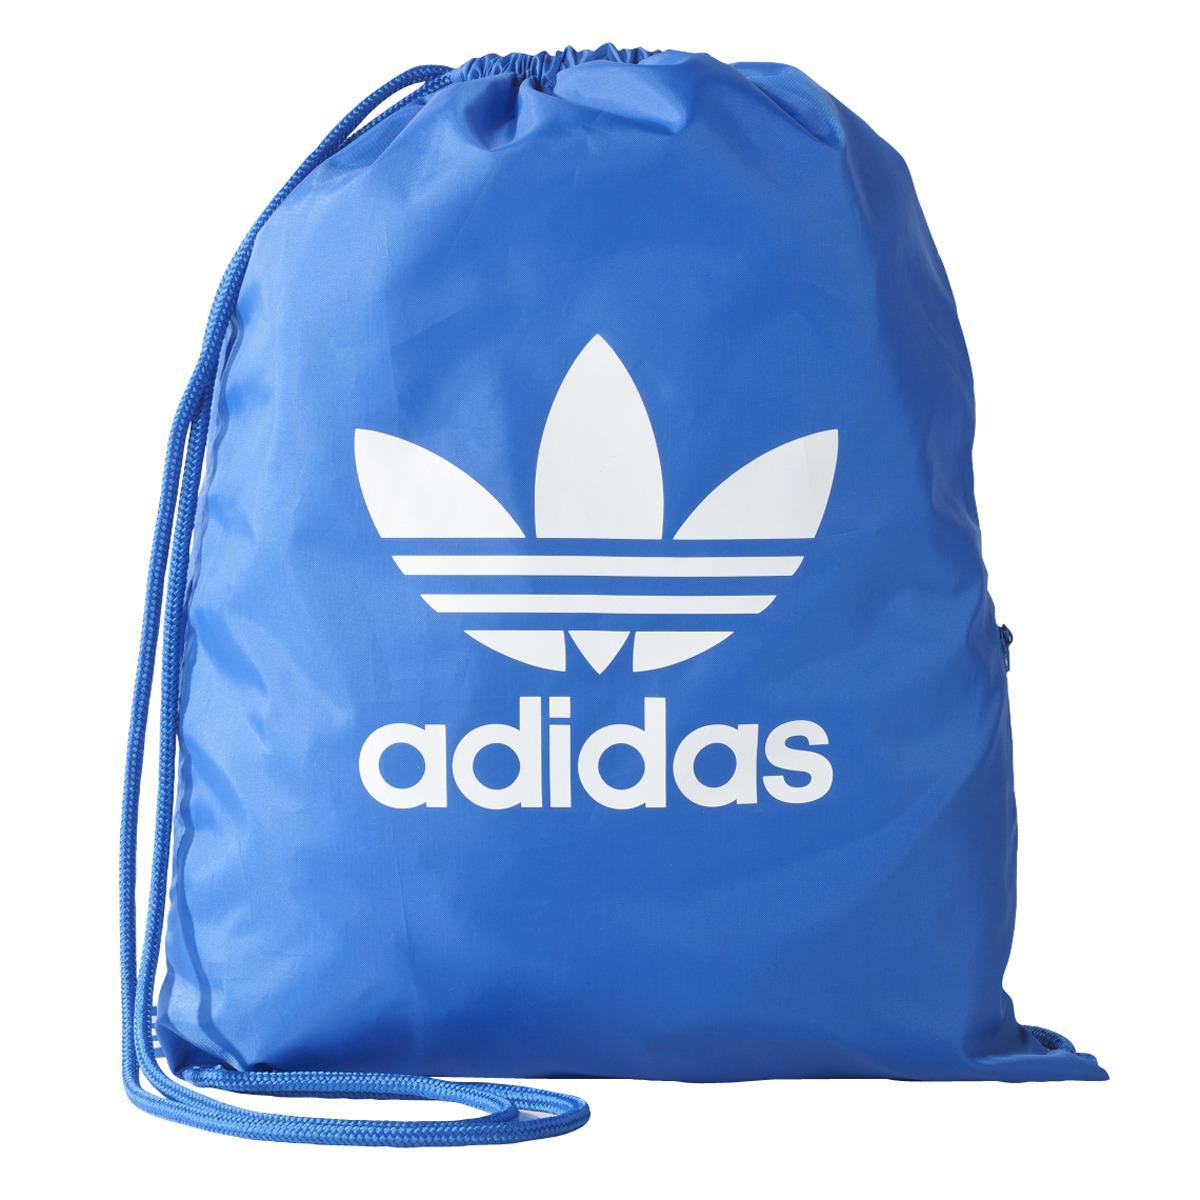 Adidas Originals. Men's Blue Gymsack Trefoil